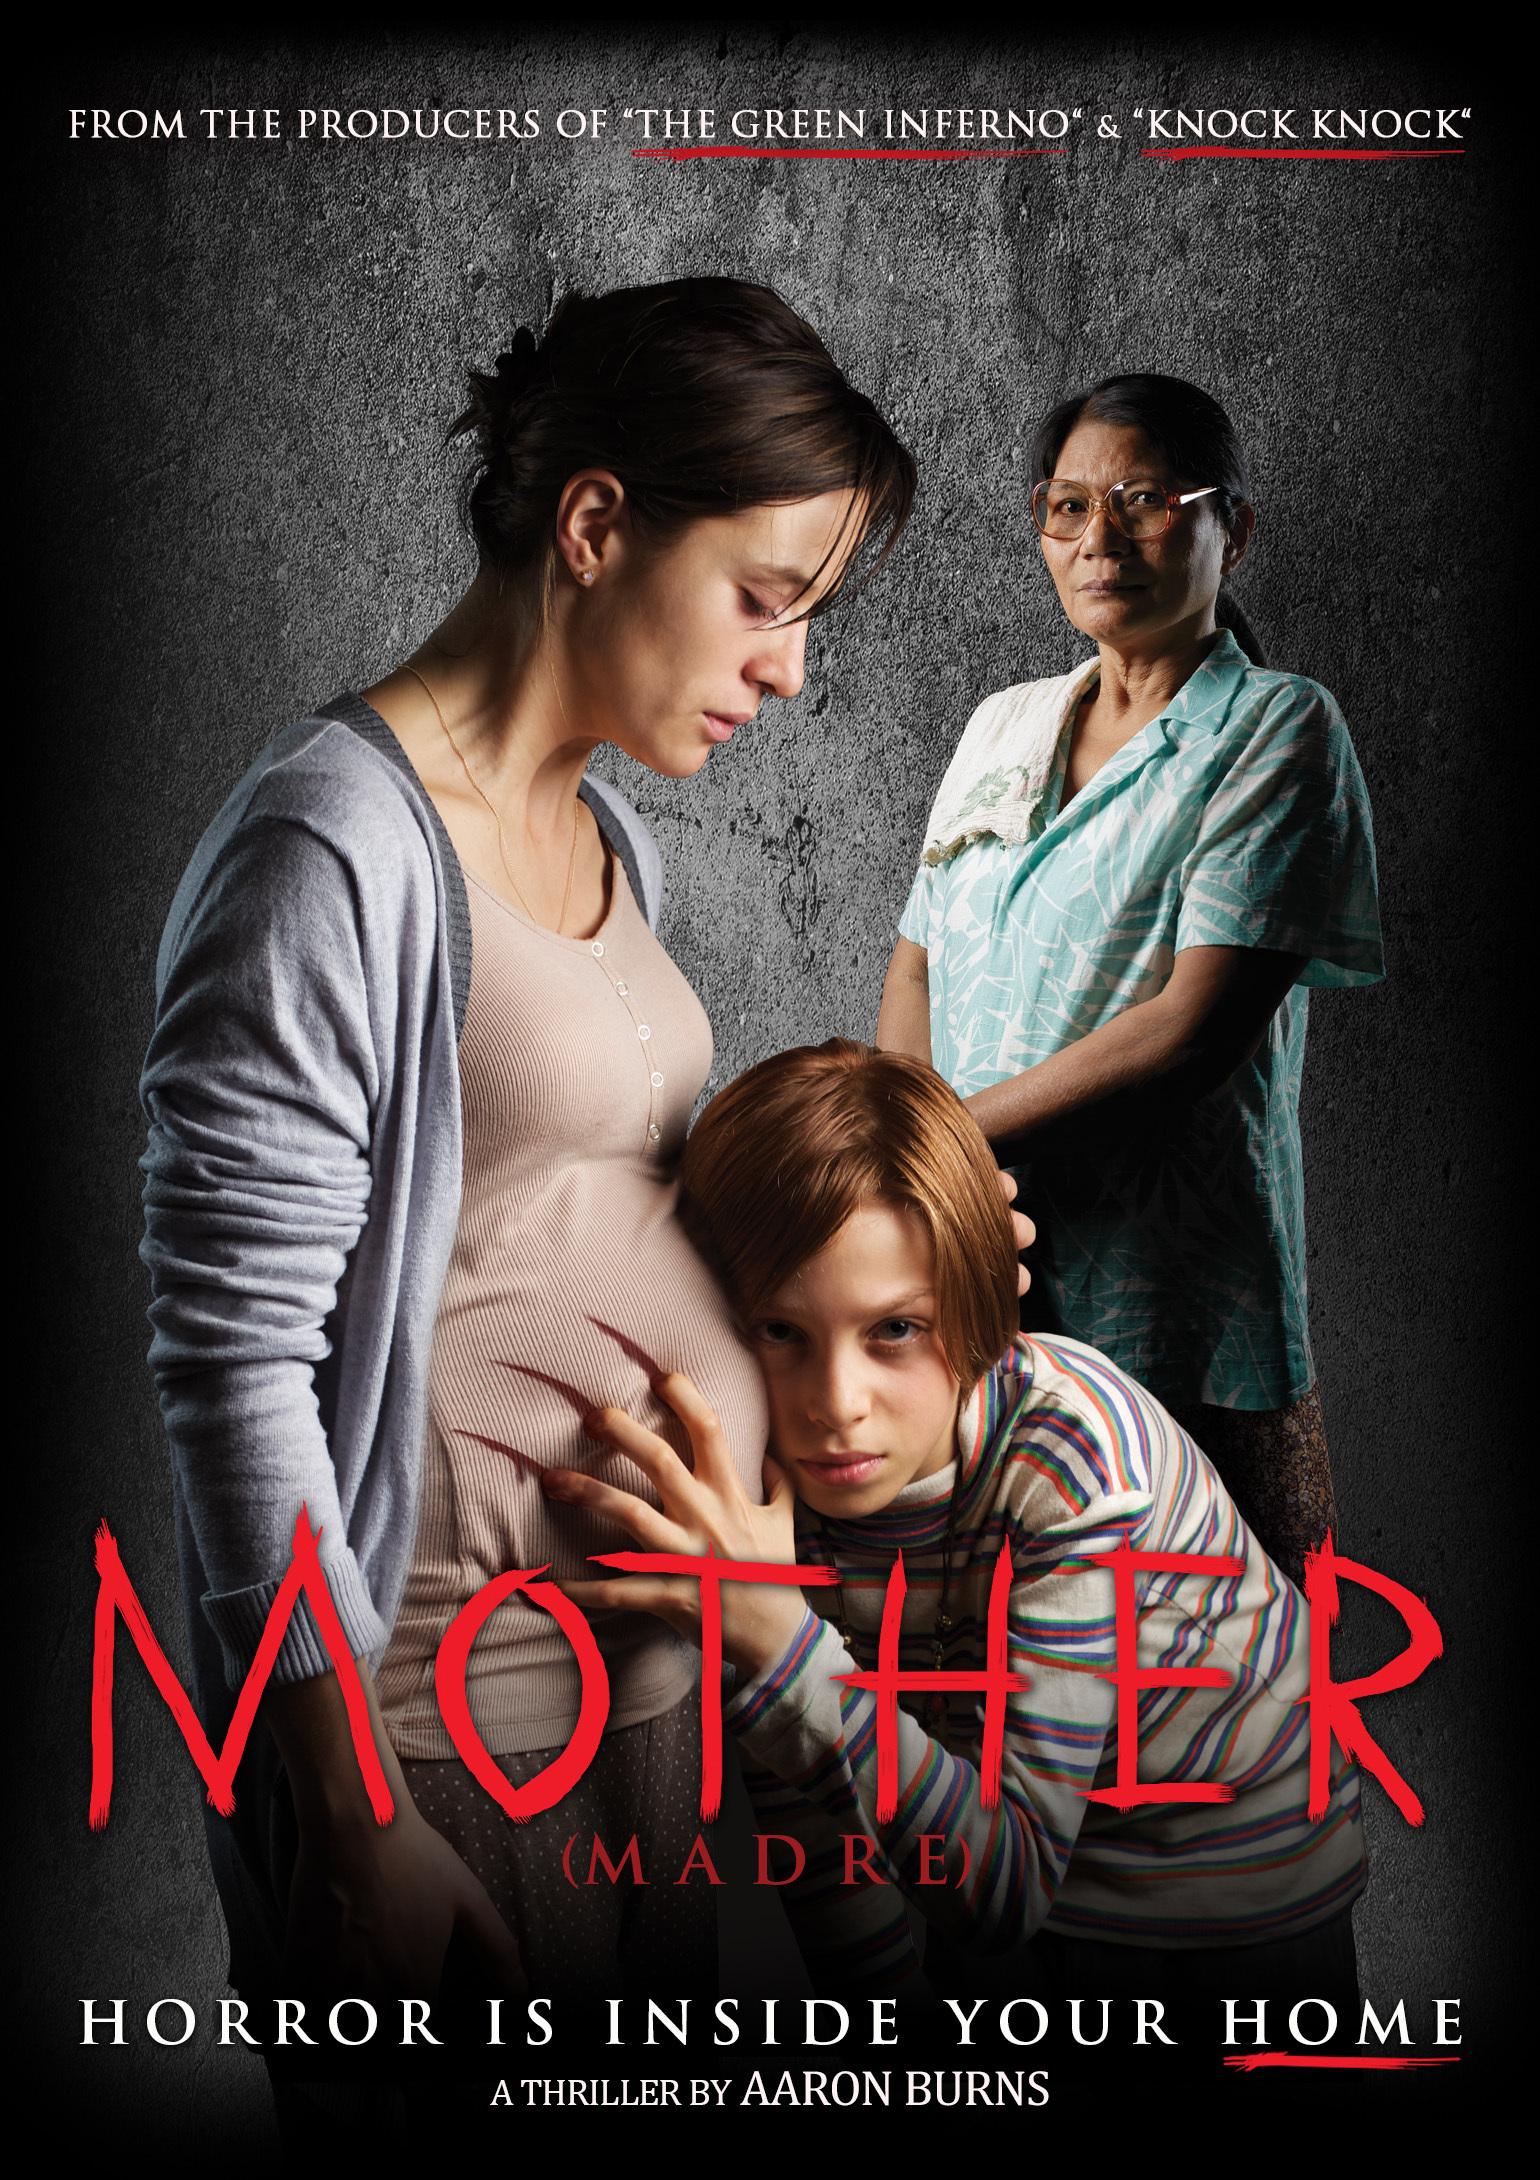 Mother_Madre_Key_Art_EN.jpg?1565018726